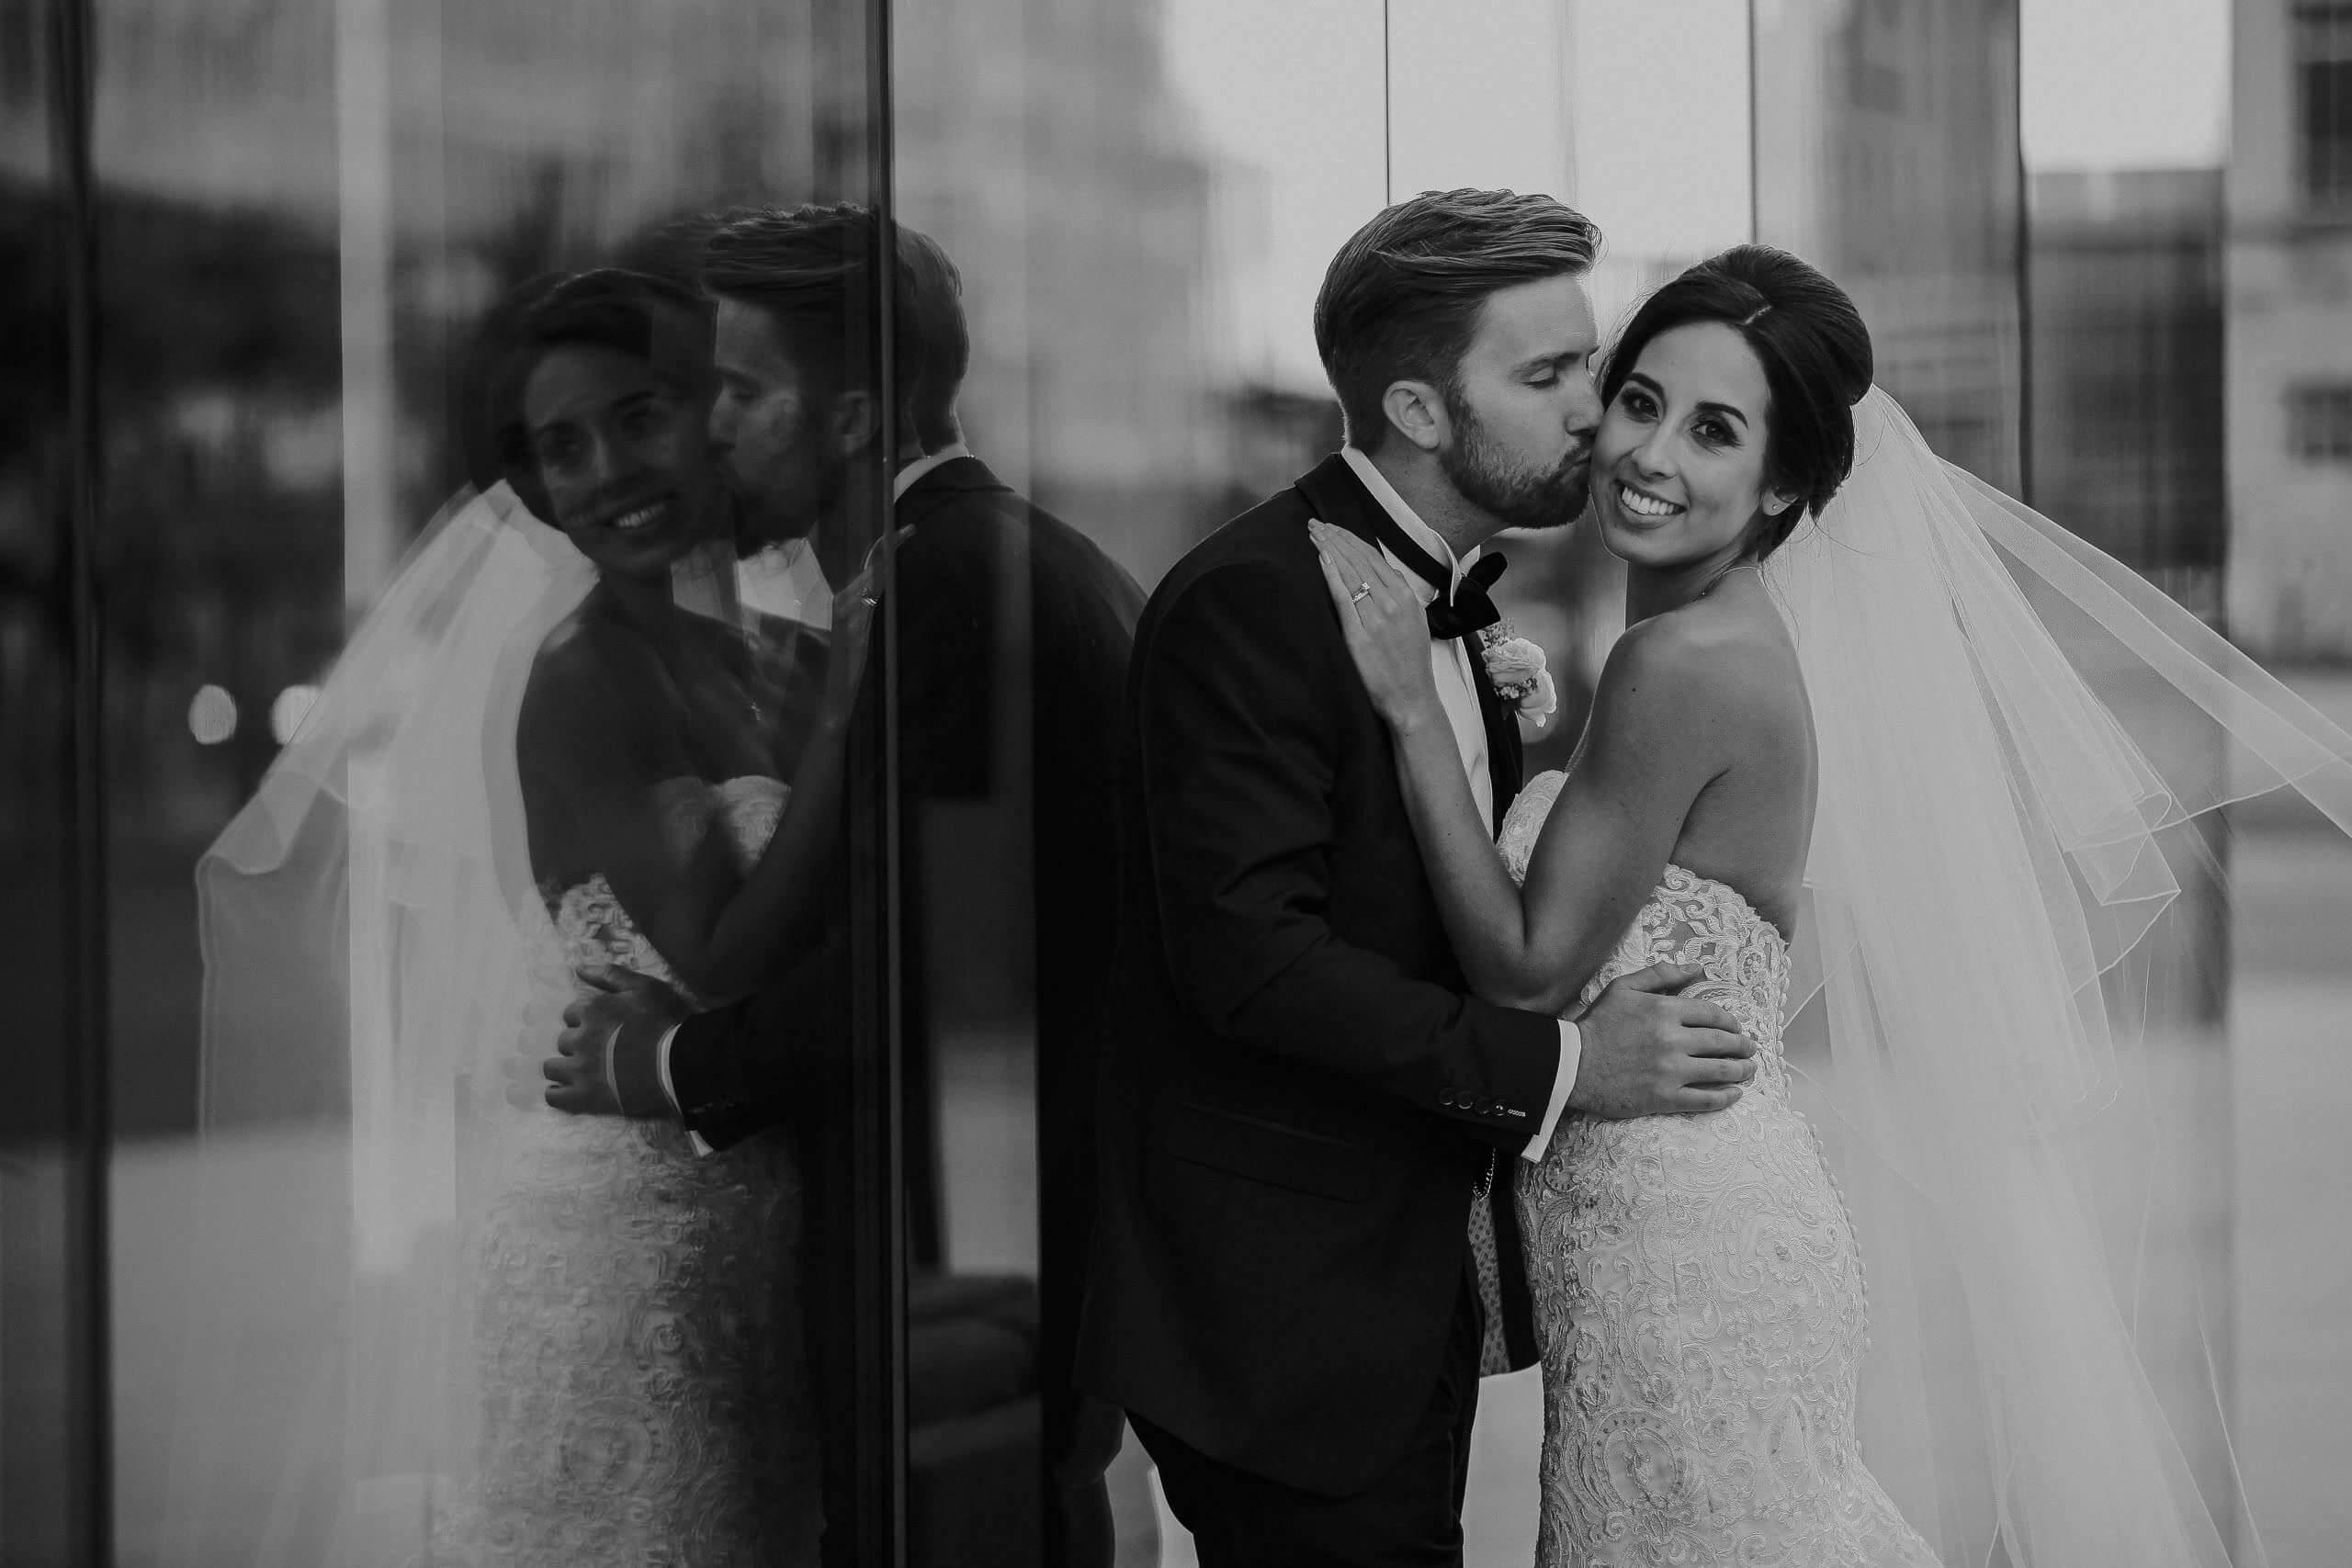 Wedding photographer Liverpool. Wes Simpson weddings video showreel